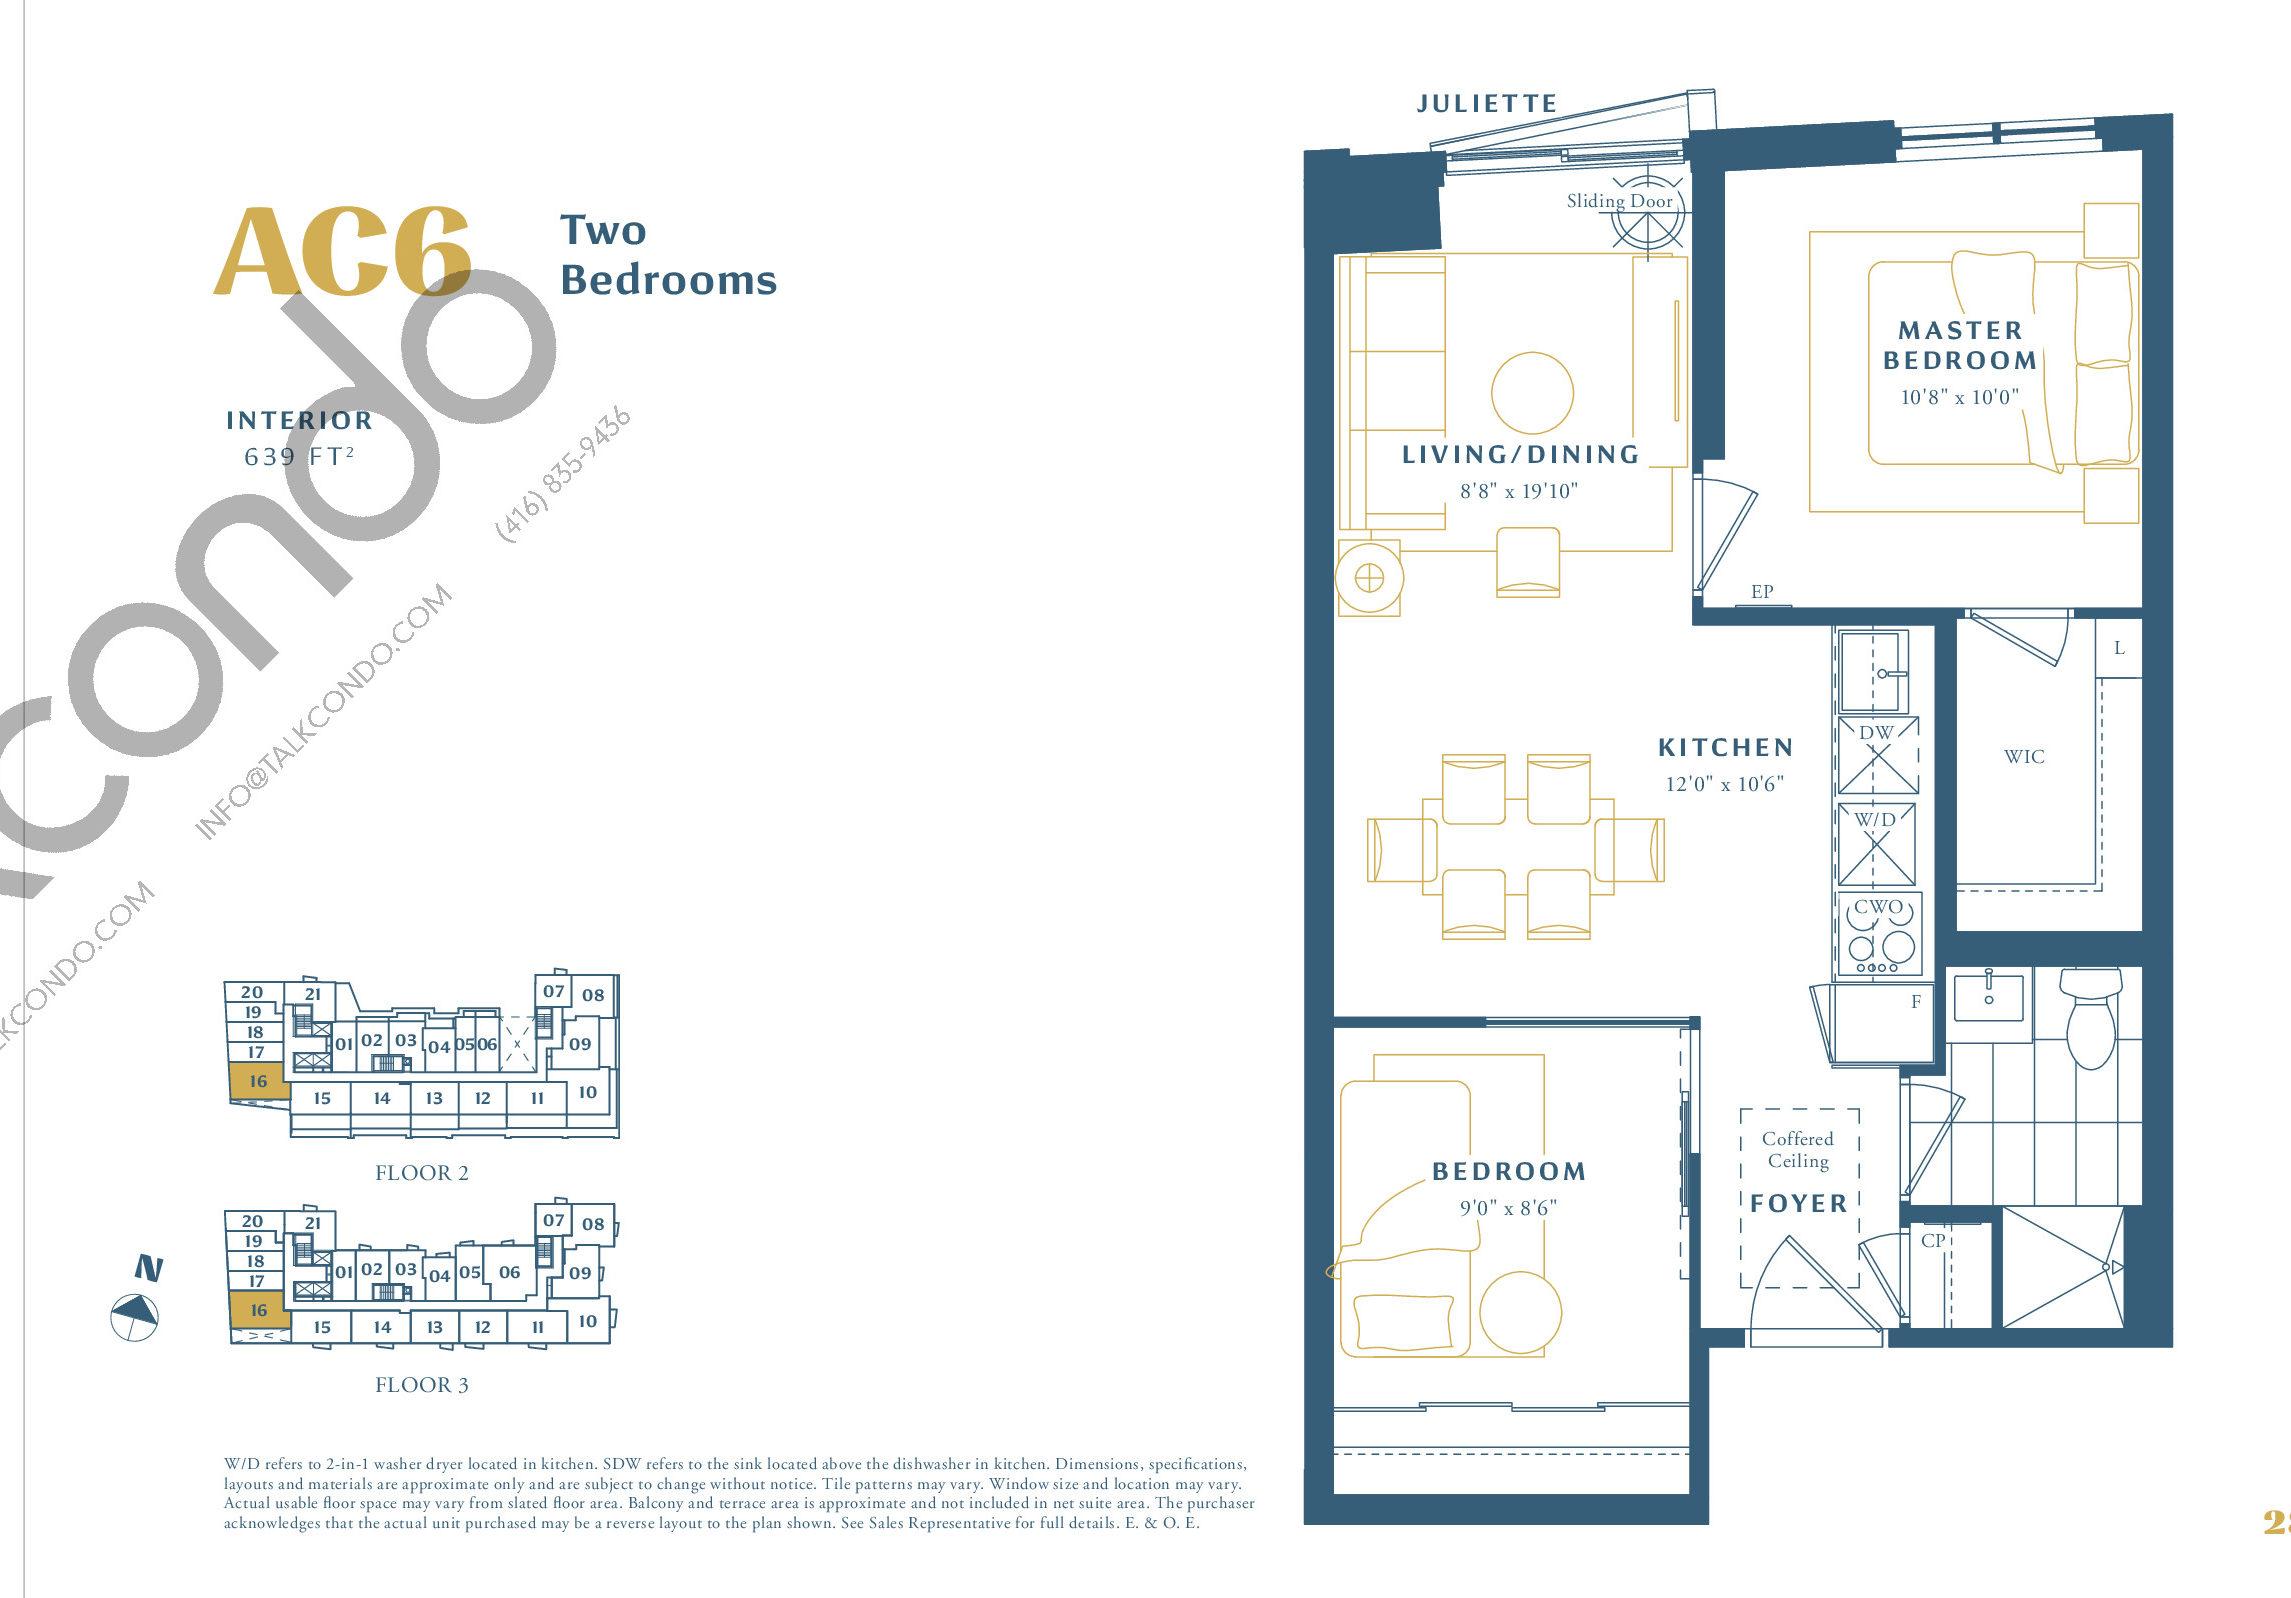 AC6 Floor Plan at The Borough Condos - Tower A - 639 sq.ft